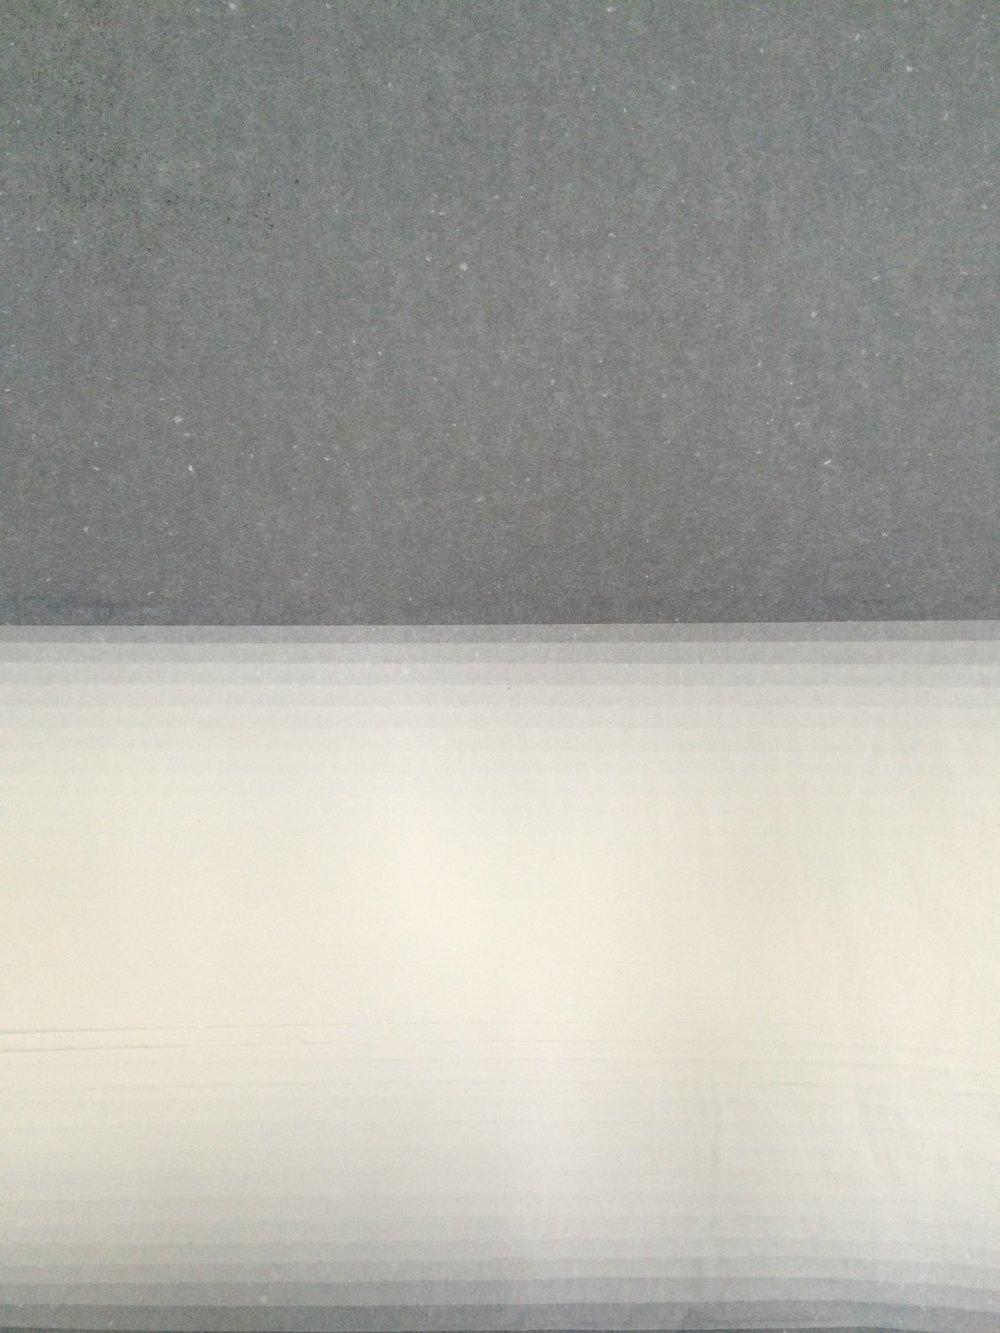 Horizontal Transition   Tissue on Black sugar paper, 49cm x 40cm, 2015